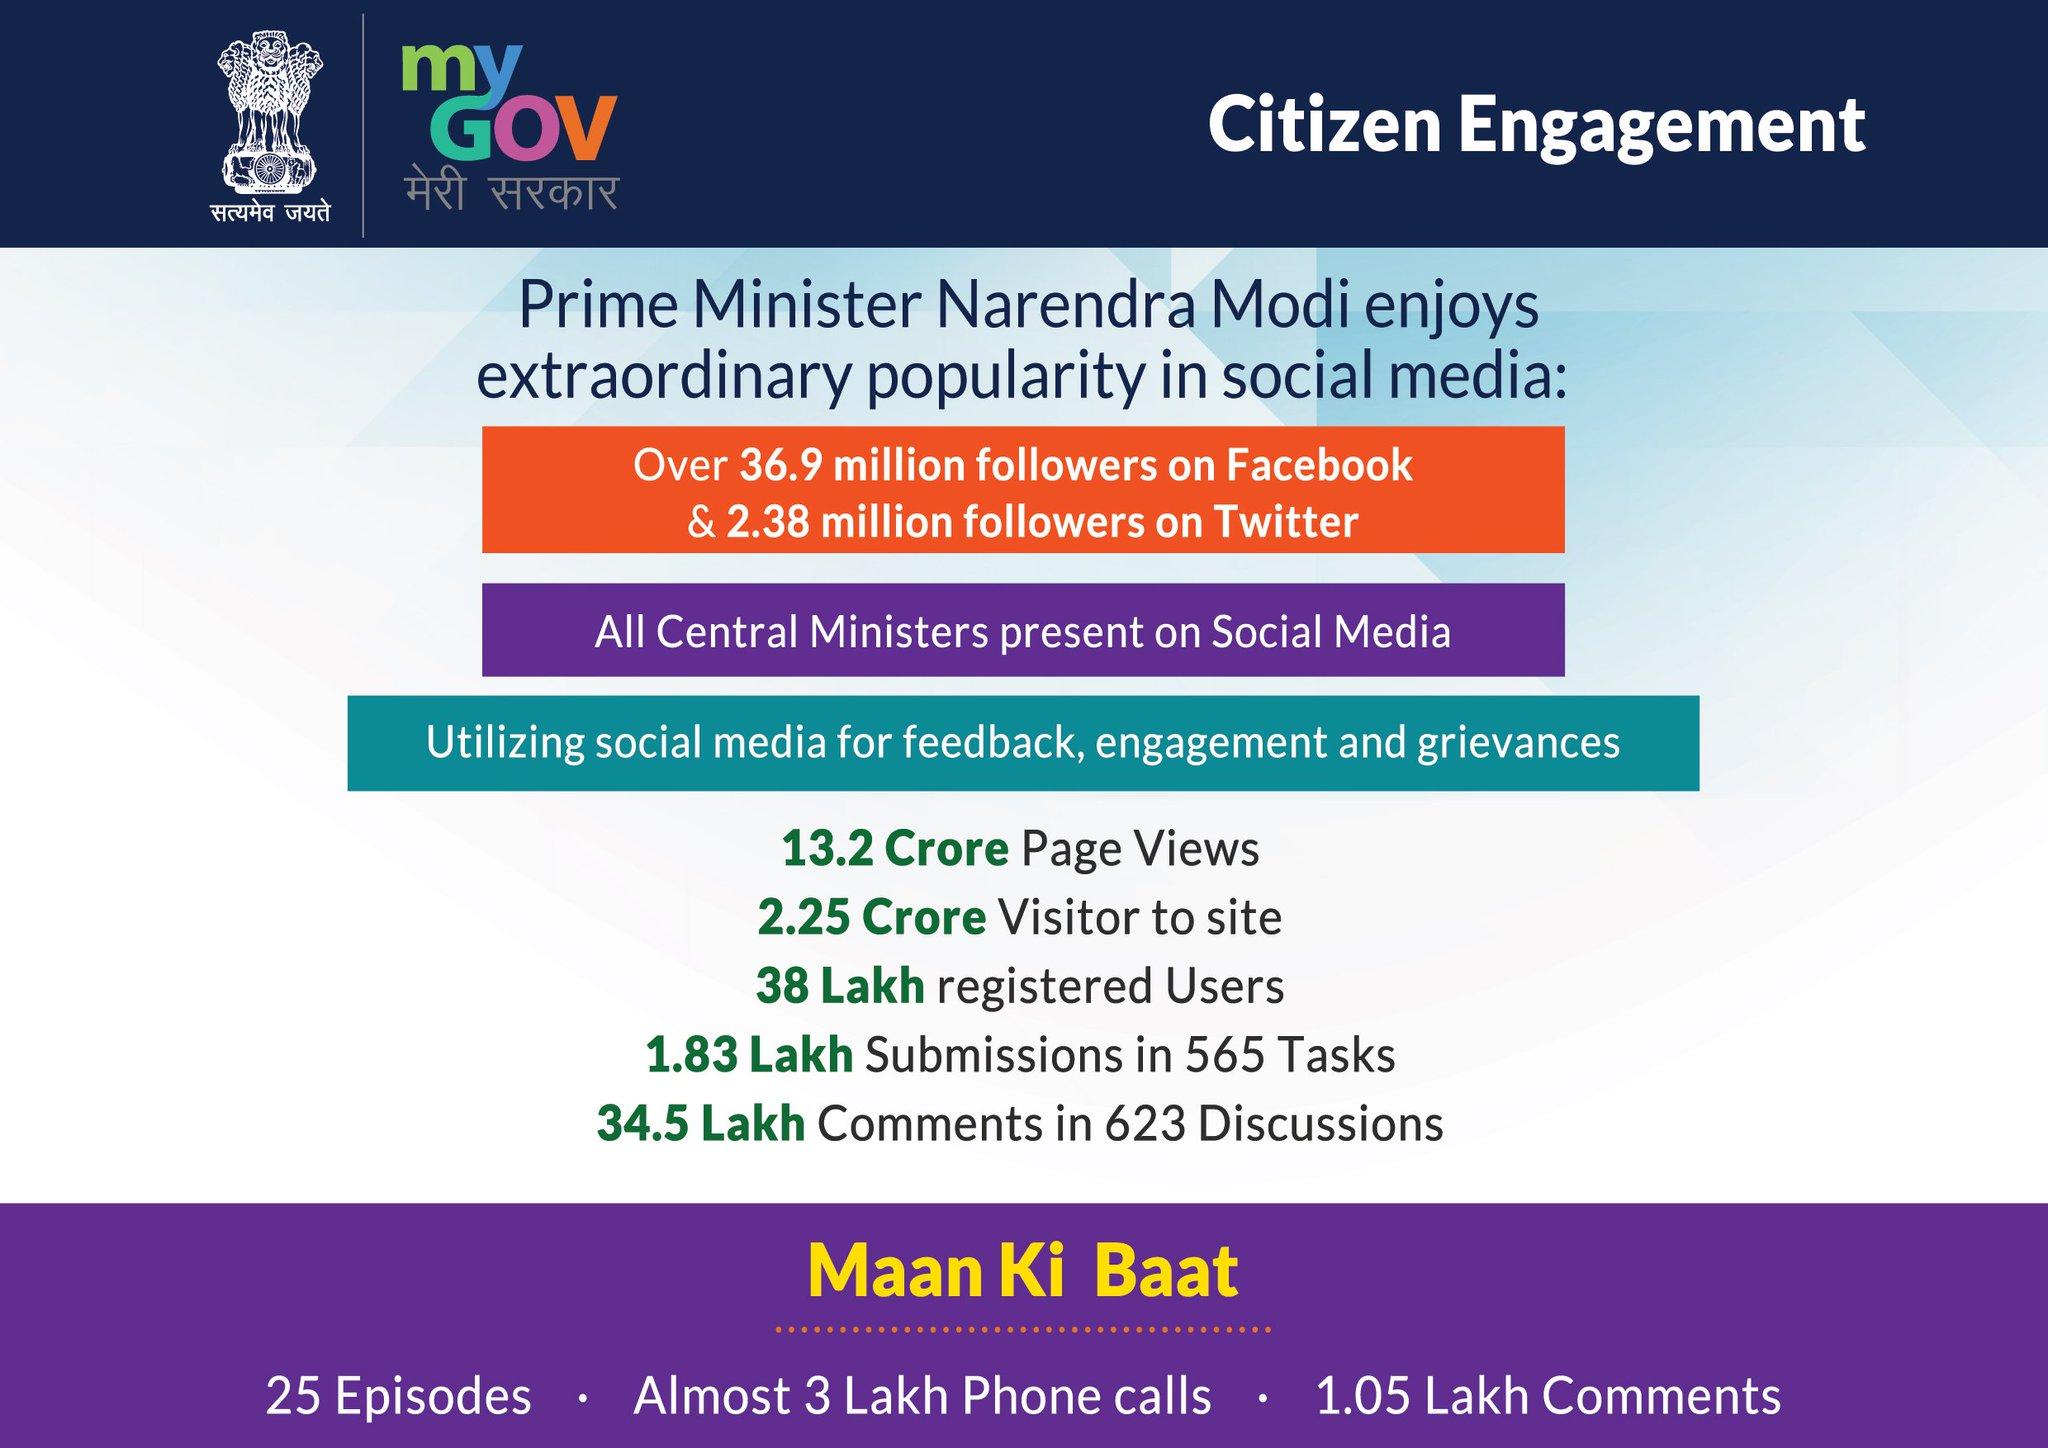 Citizen Engagement is #TransformingIndia through #DigitalIndia. #EEC2016 https://t.co/WHyiUf99dy